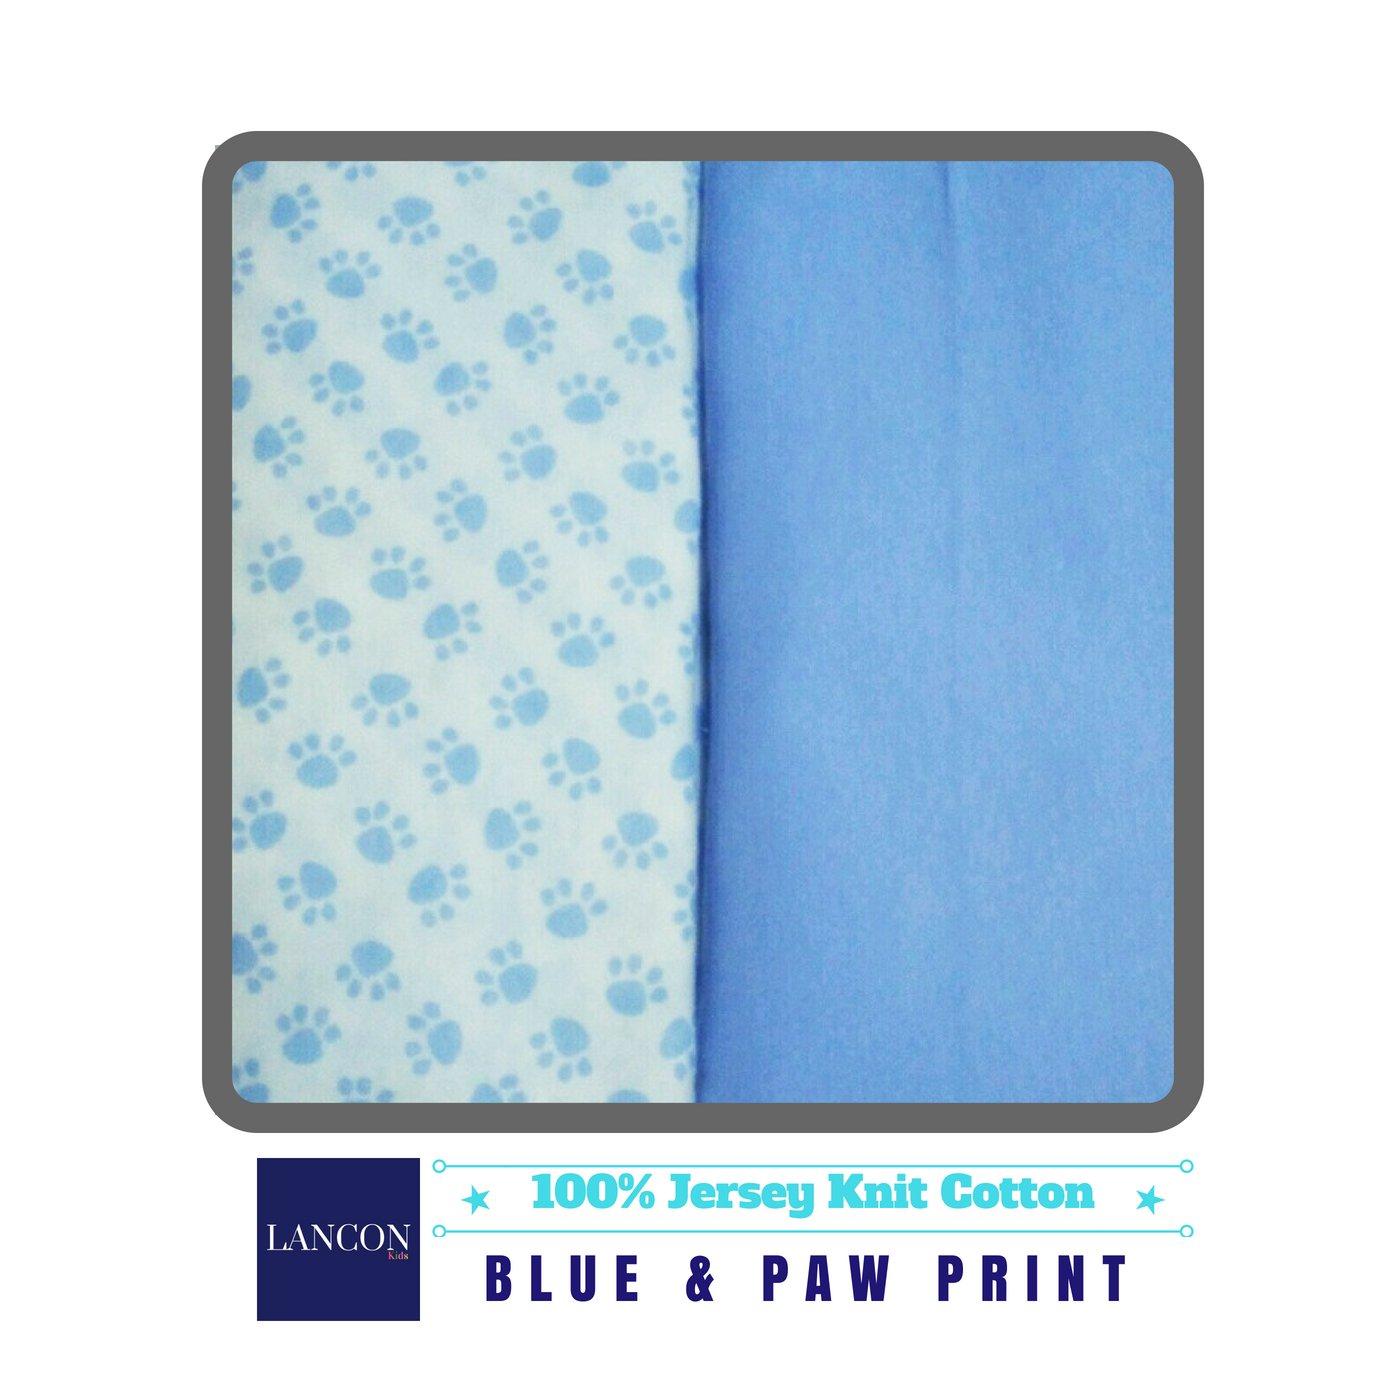 2 Pack 100/% Jersey Knit Cotton Blue /& Paw Print Bassinet Sheet Set by LANCON Kids